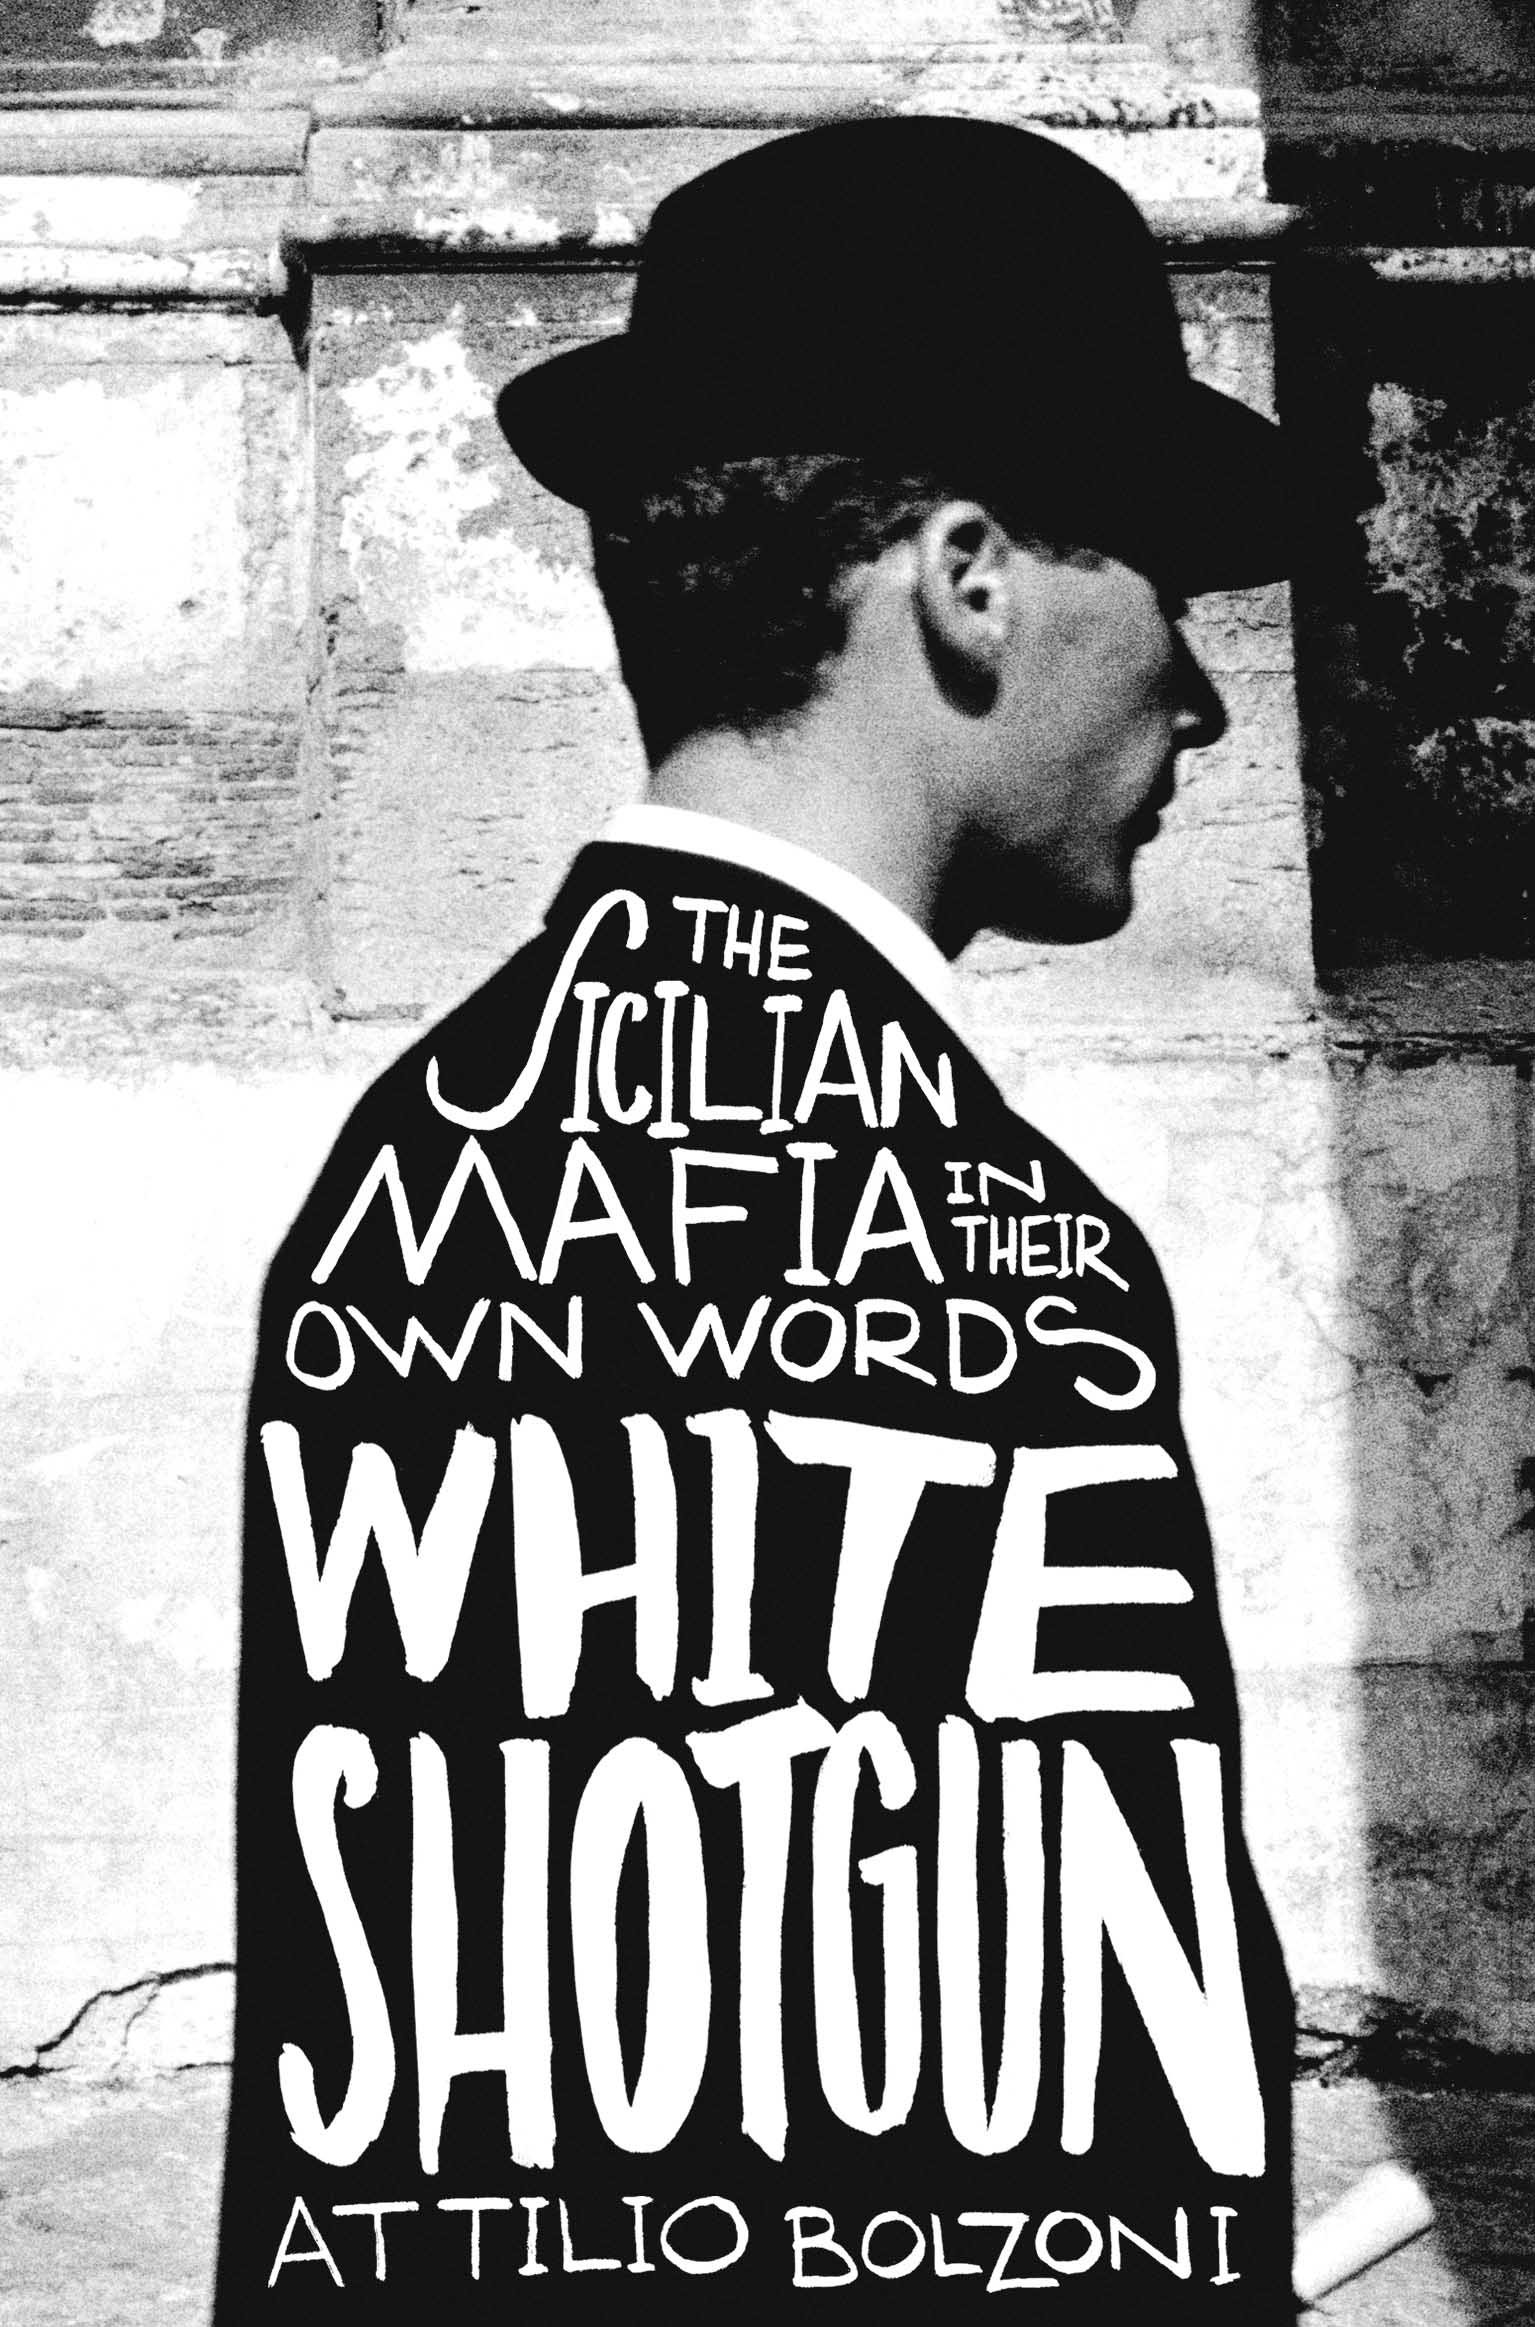 White Shotgun  The Sicilian Mafia in Their Own Words  Amazon.co.uk ... 7701f560aed6